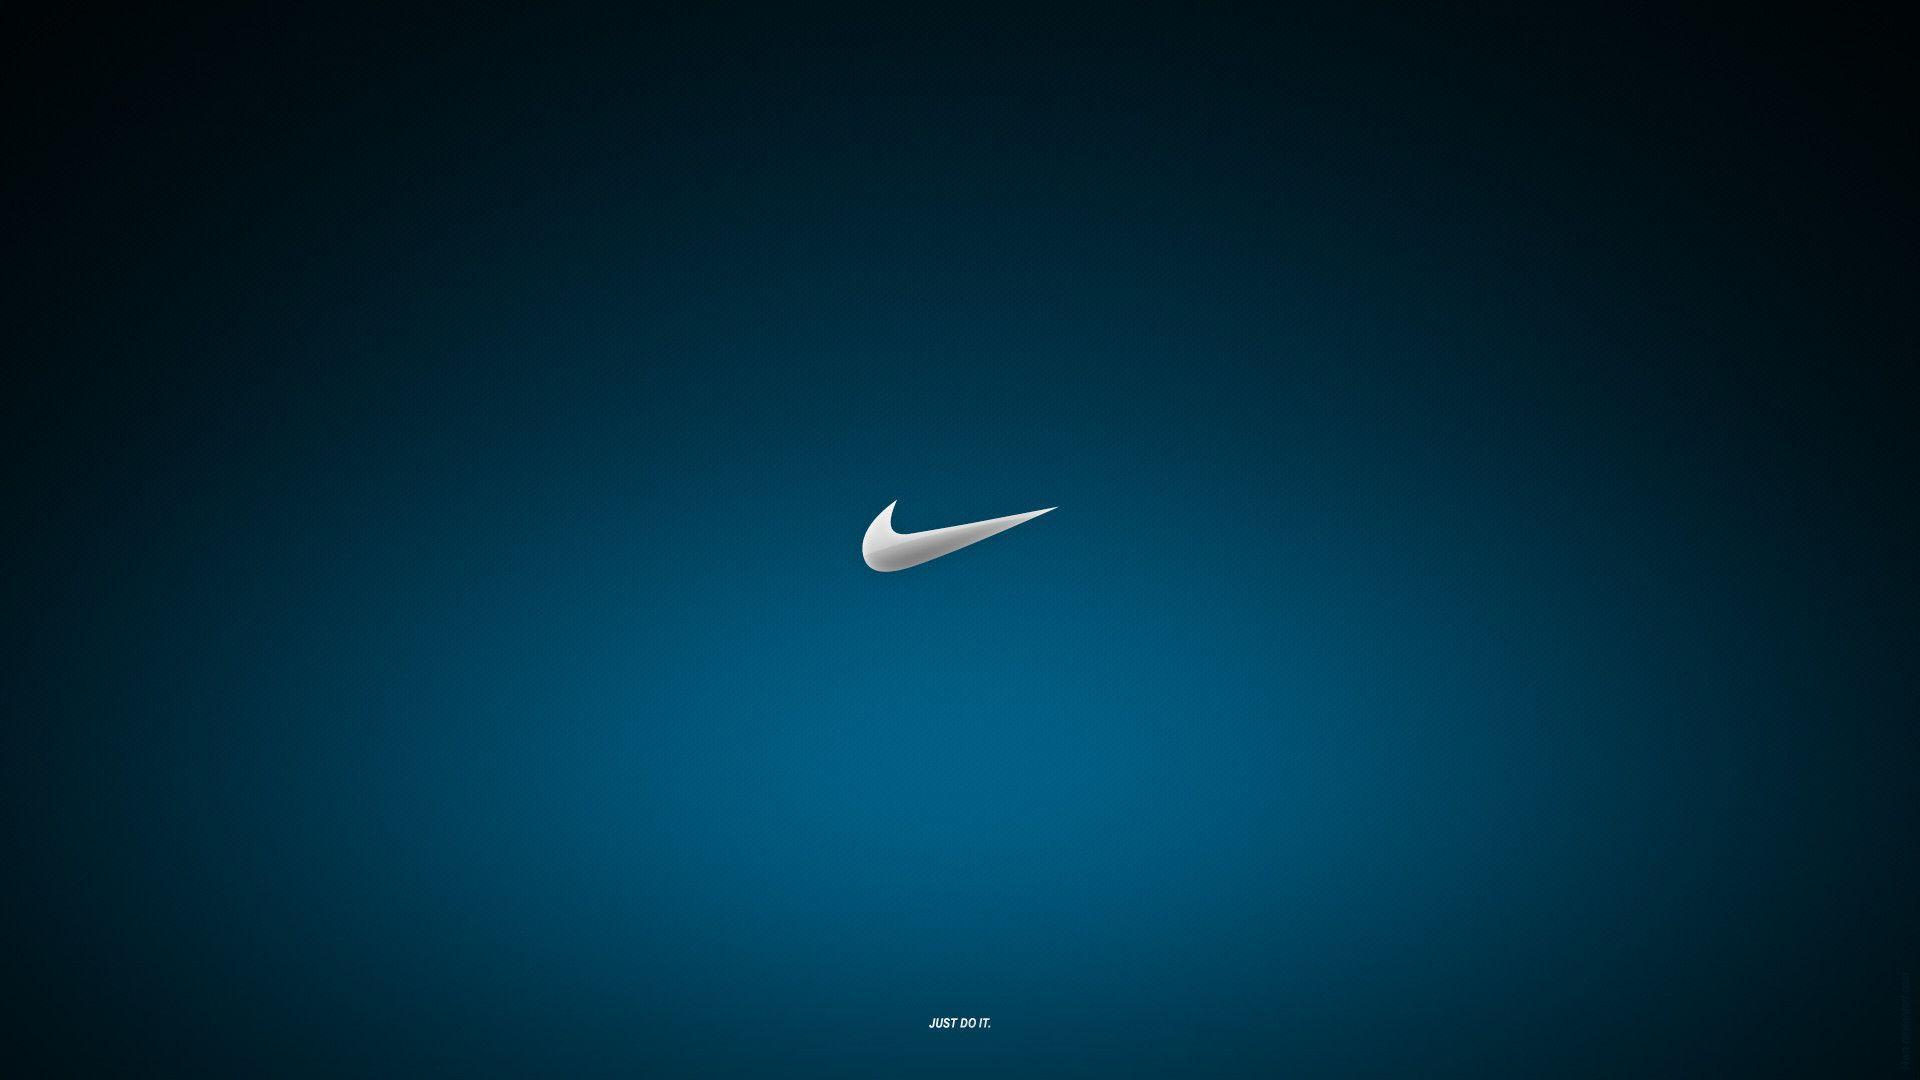 Nike Computer Wallpapers, Desktop Backgrounds 1920x1080 Id: 212237